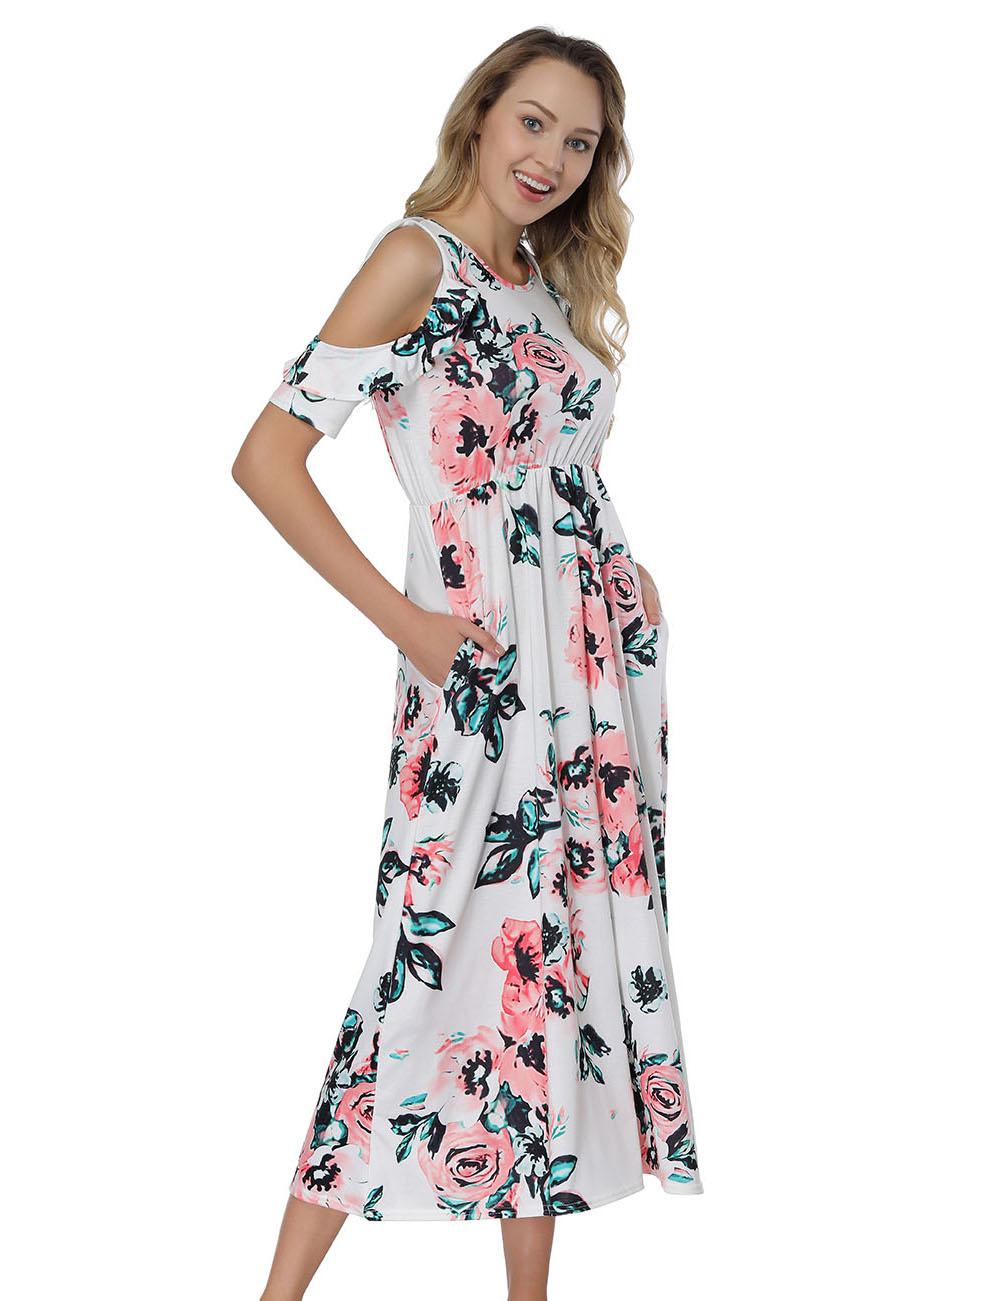 2018 Hot Fashion Womancold Shoulder White Floral Print Midi Dresses